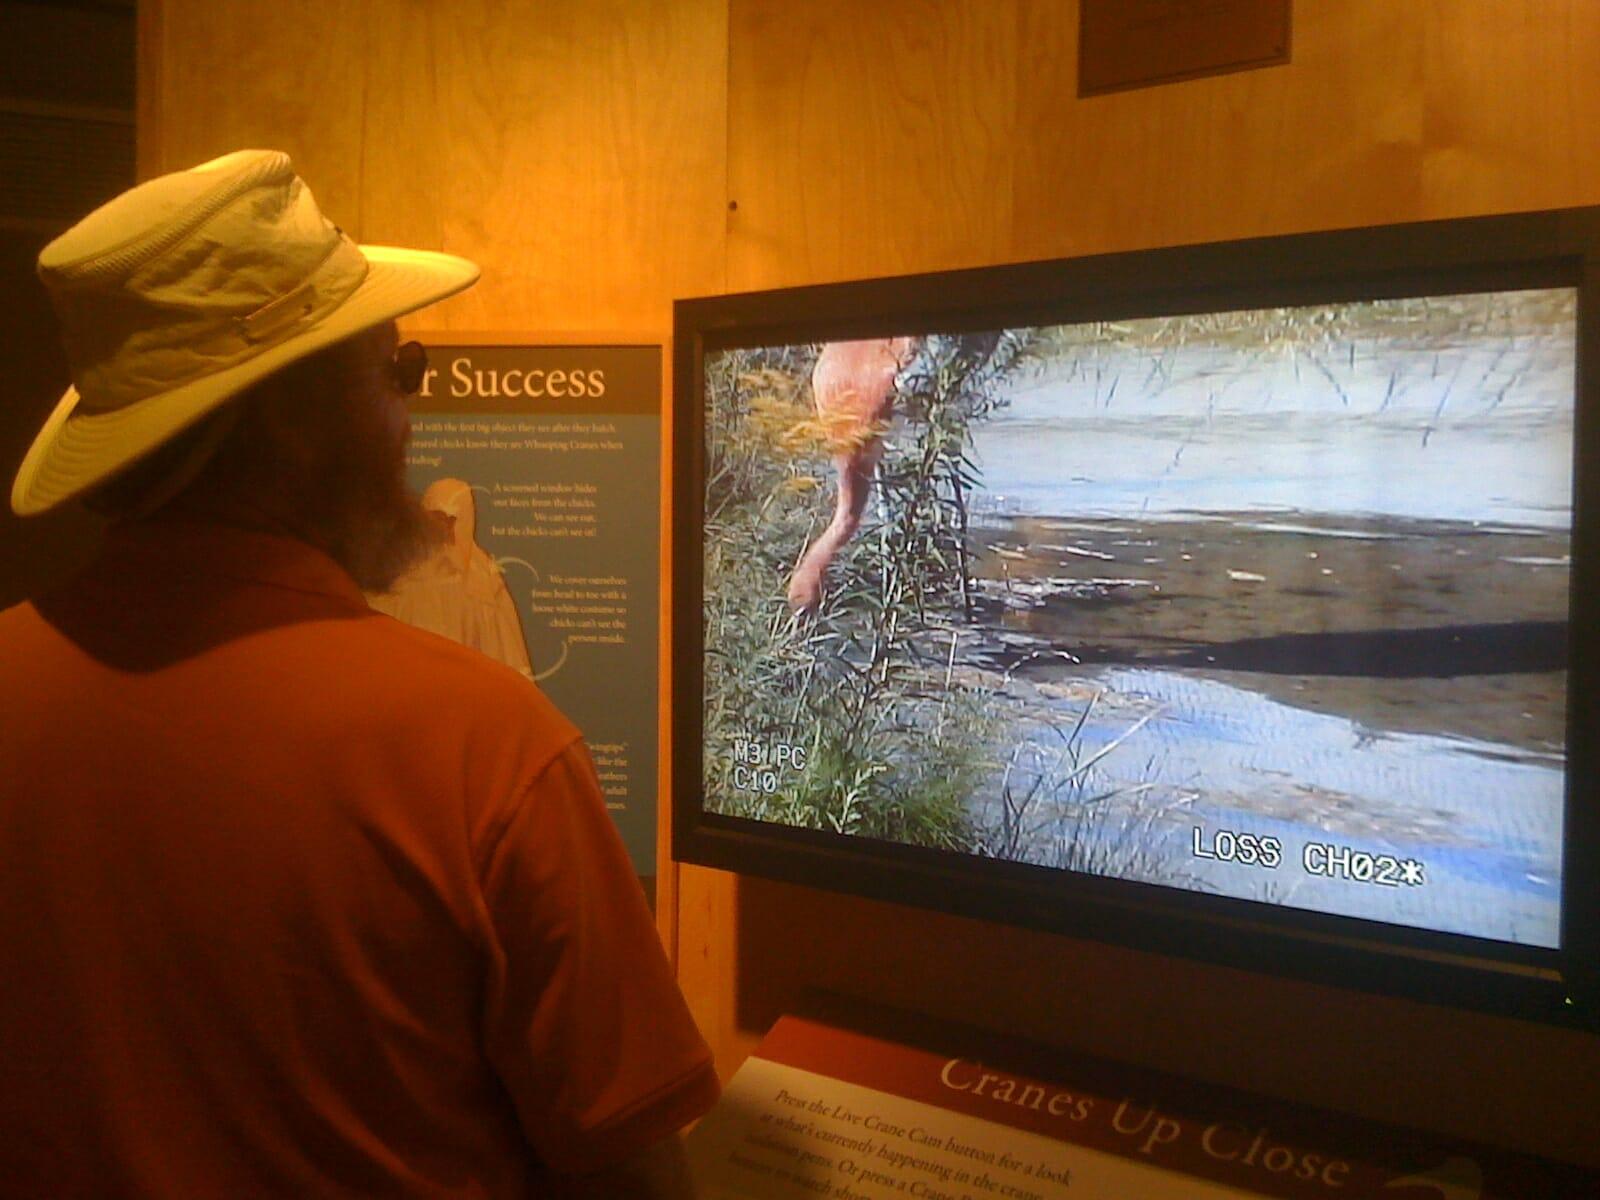 Visiting the International Crane Foundation in Baraboo, Wisconsin